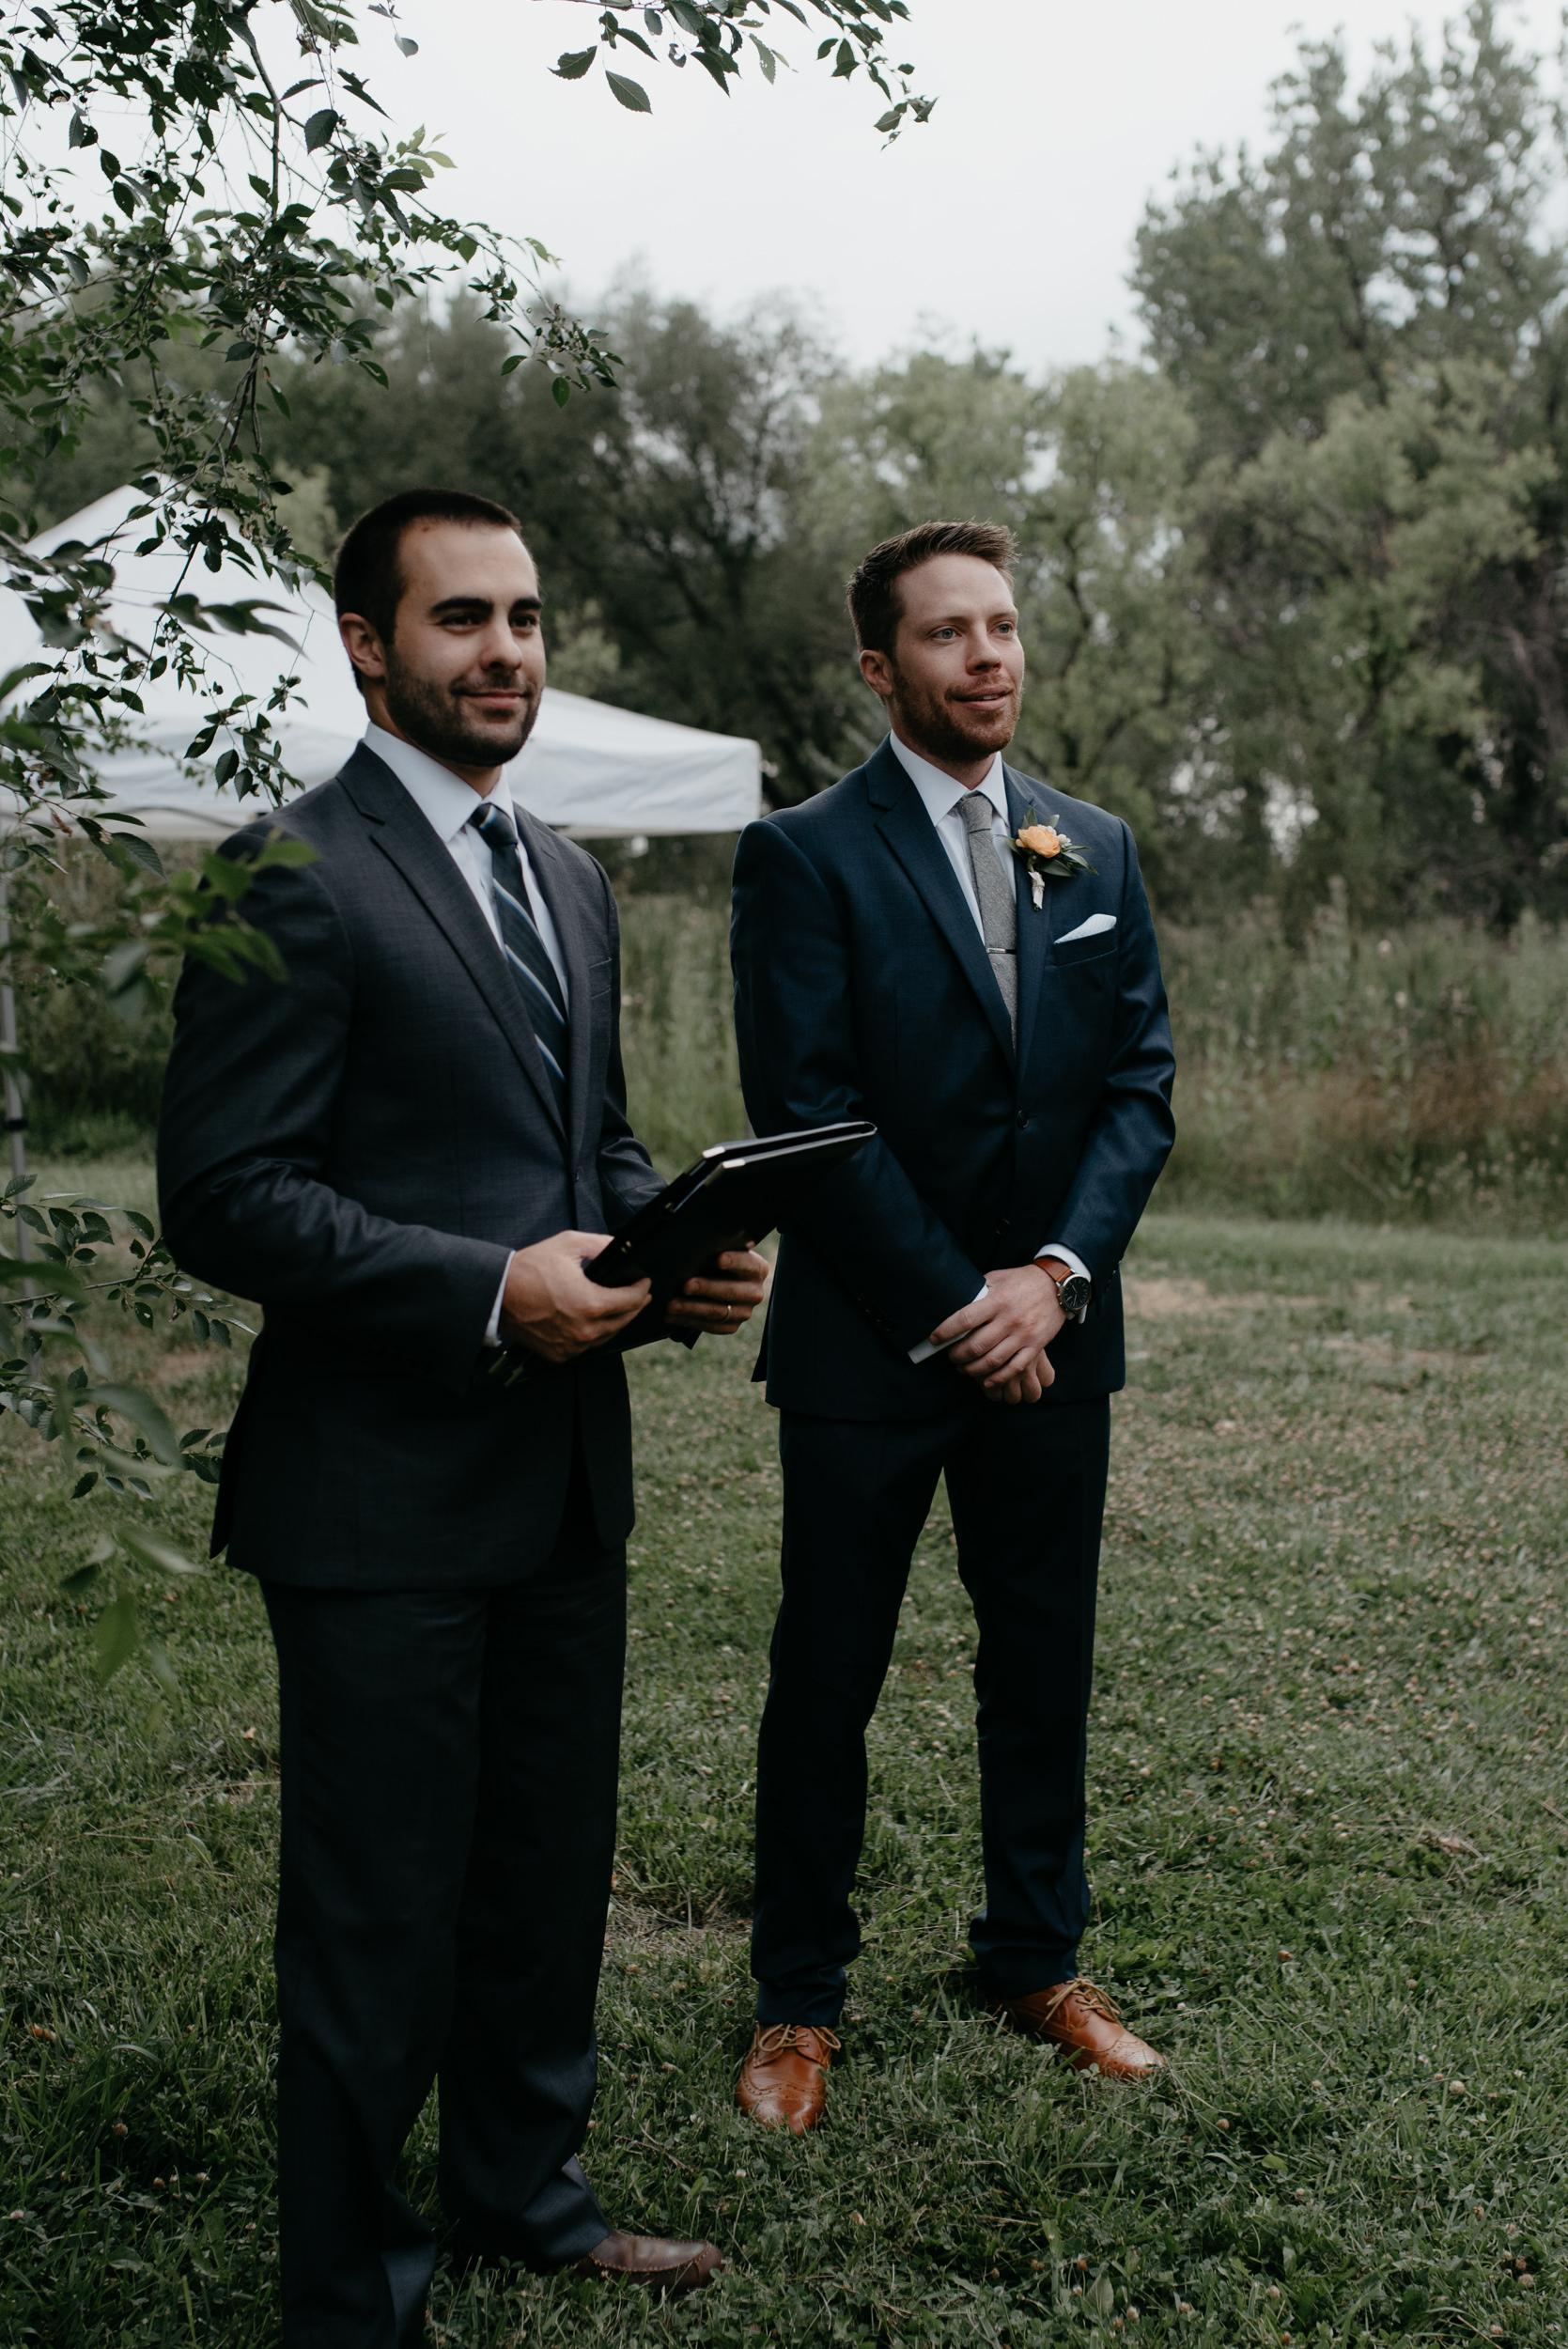 Three Leaf Farm wedding ceremony in Boulder, Colorado. Boulder wedding and elopement photographer.